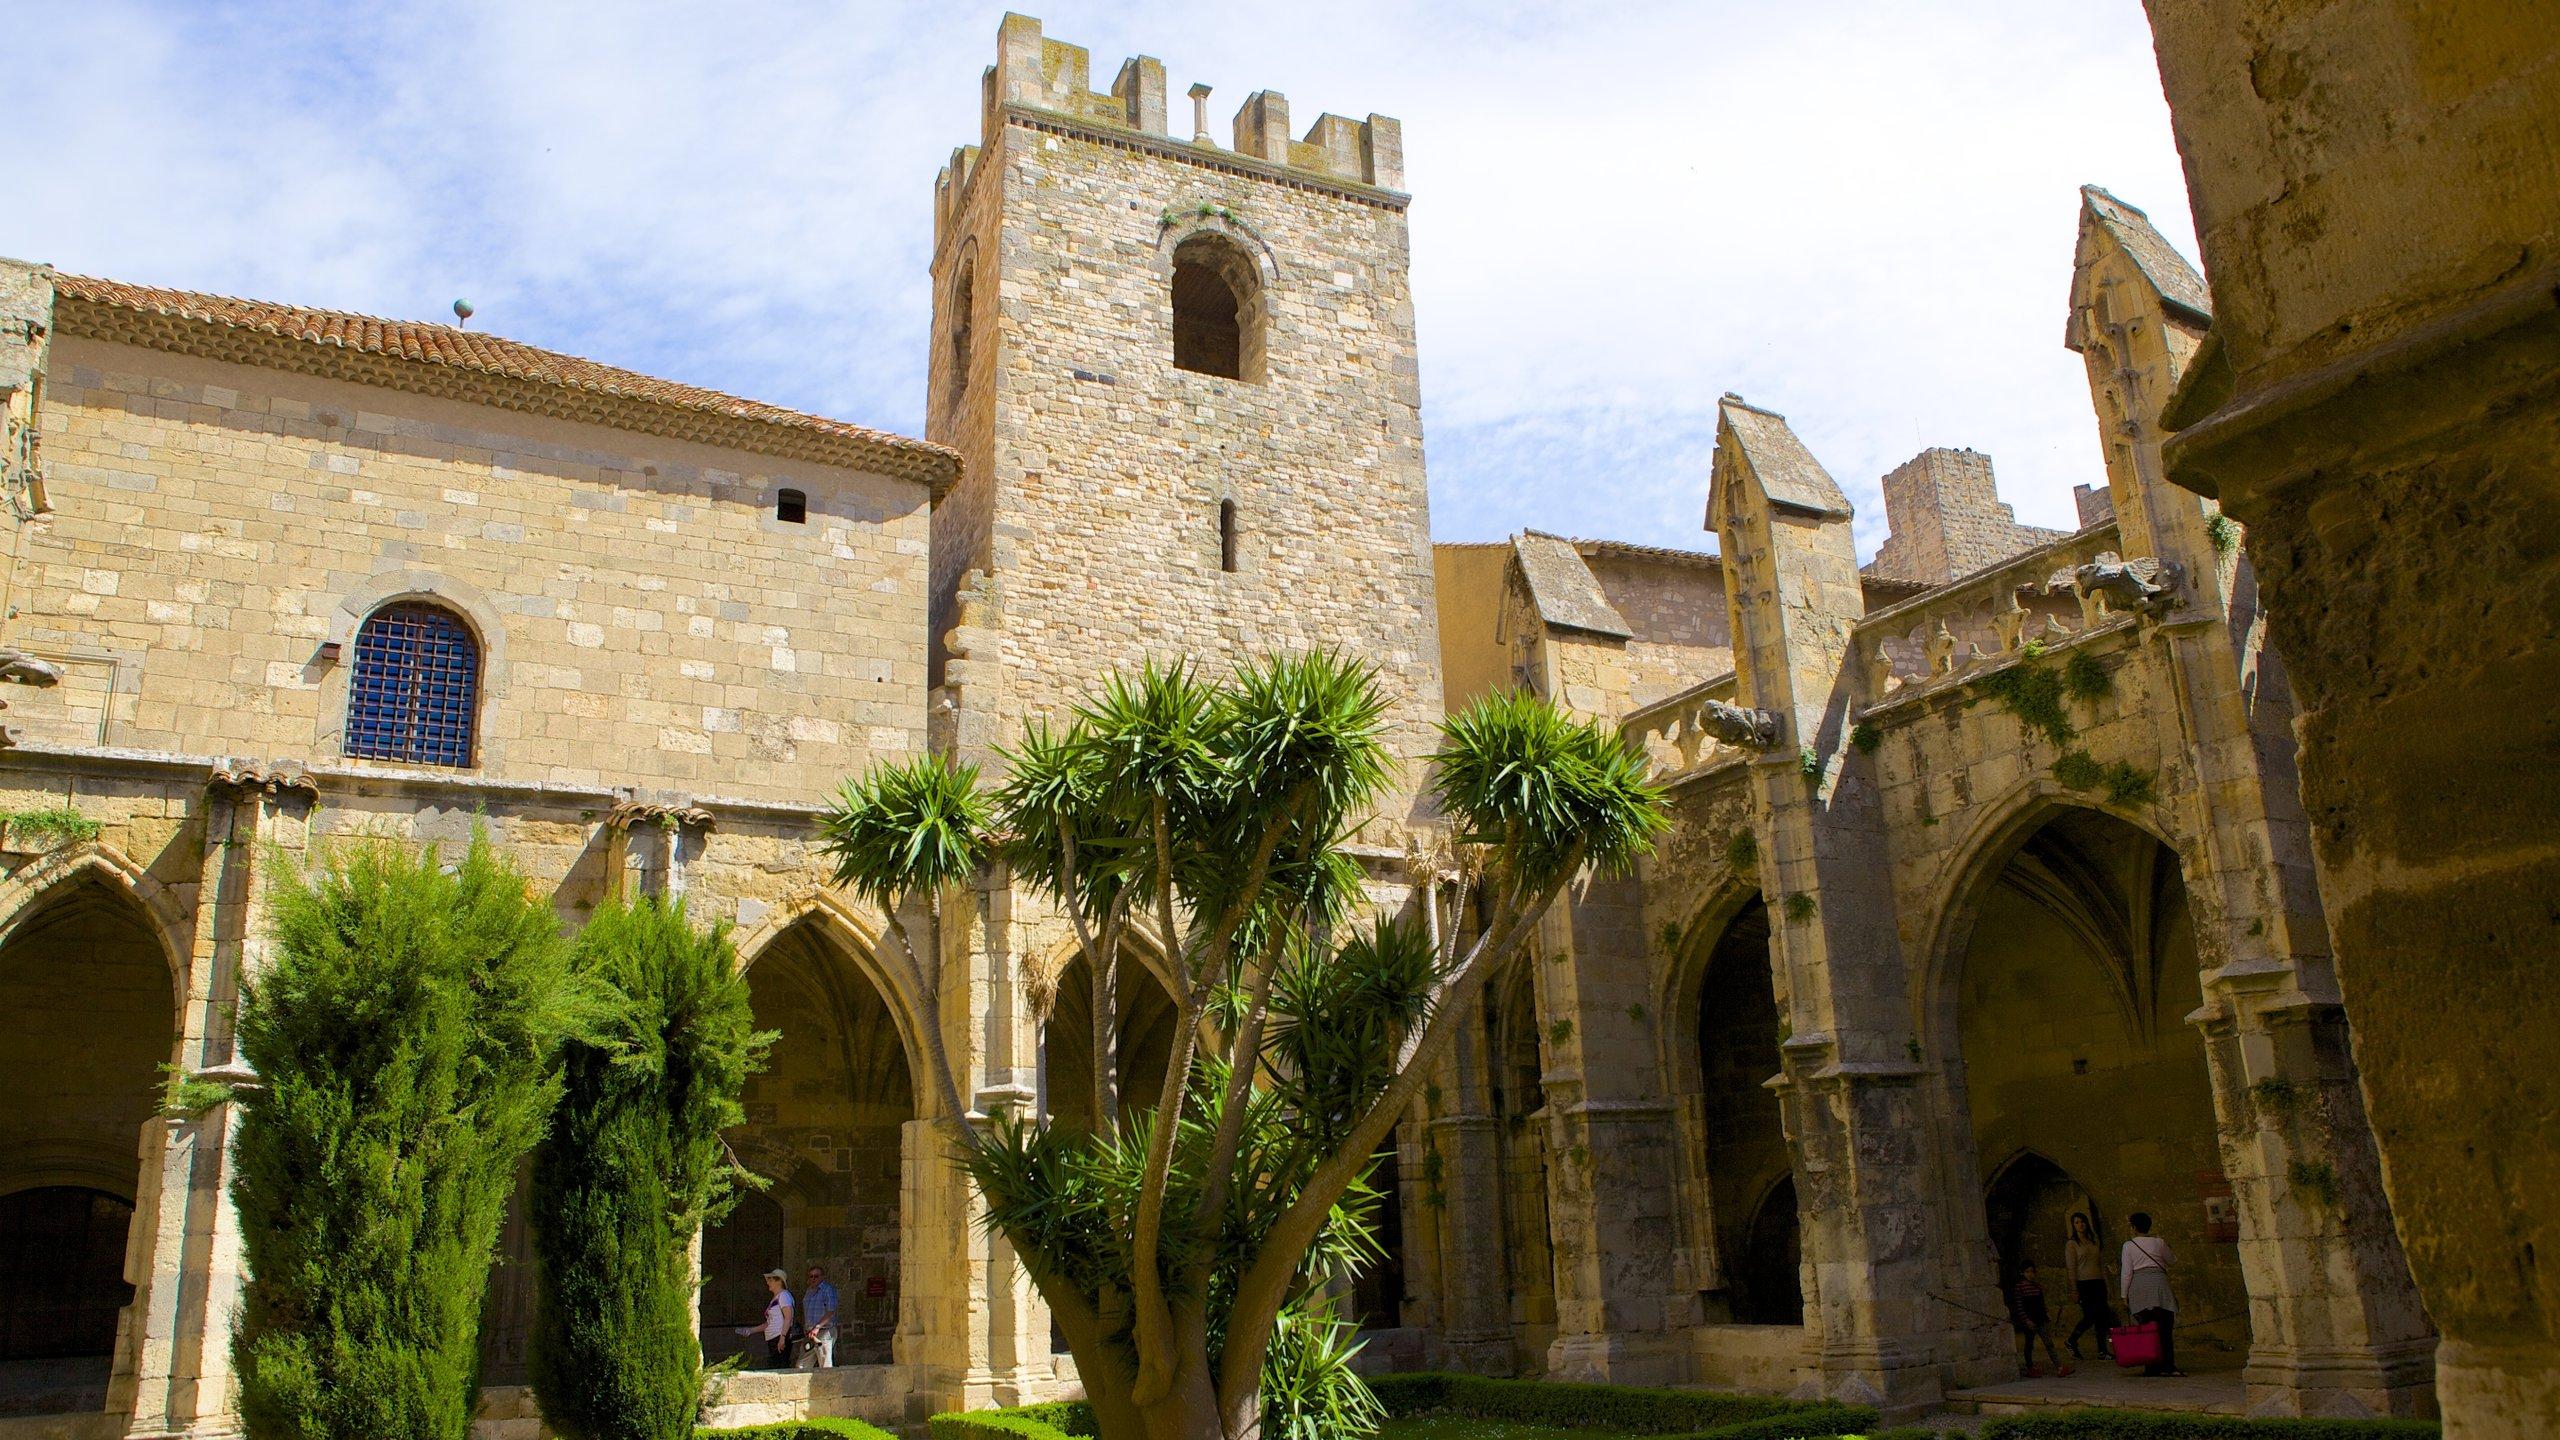 Katedra w Narbonne, Narbona, Aude (department), Francja